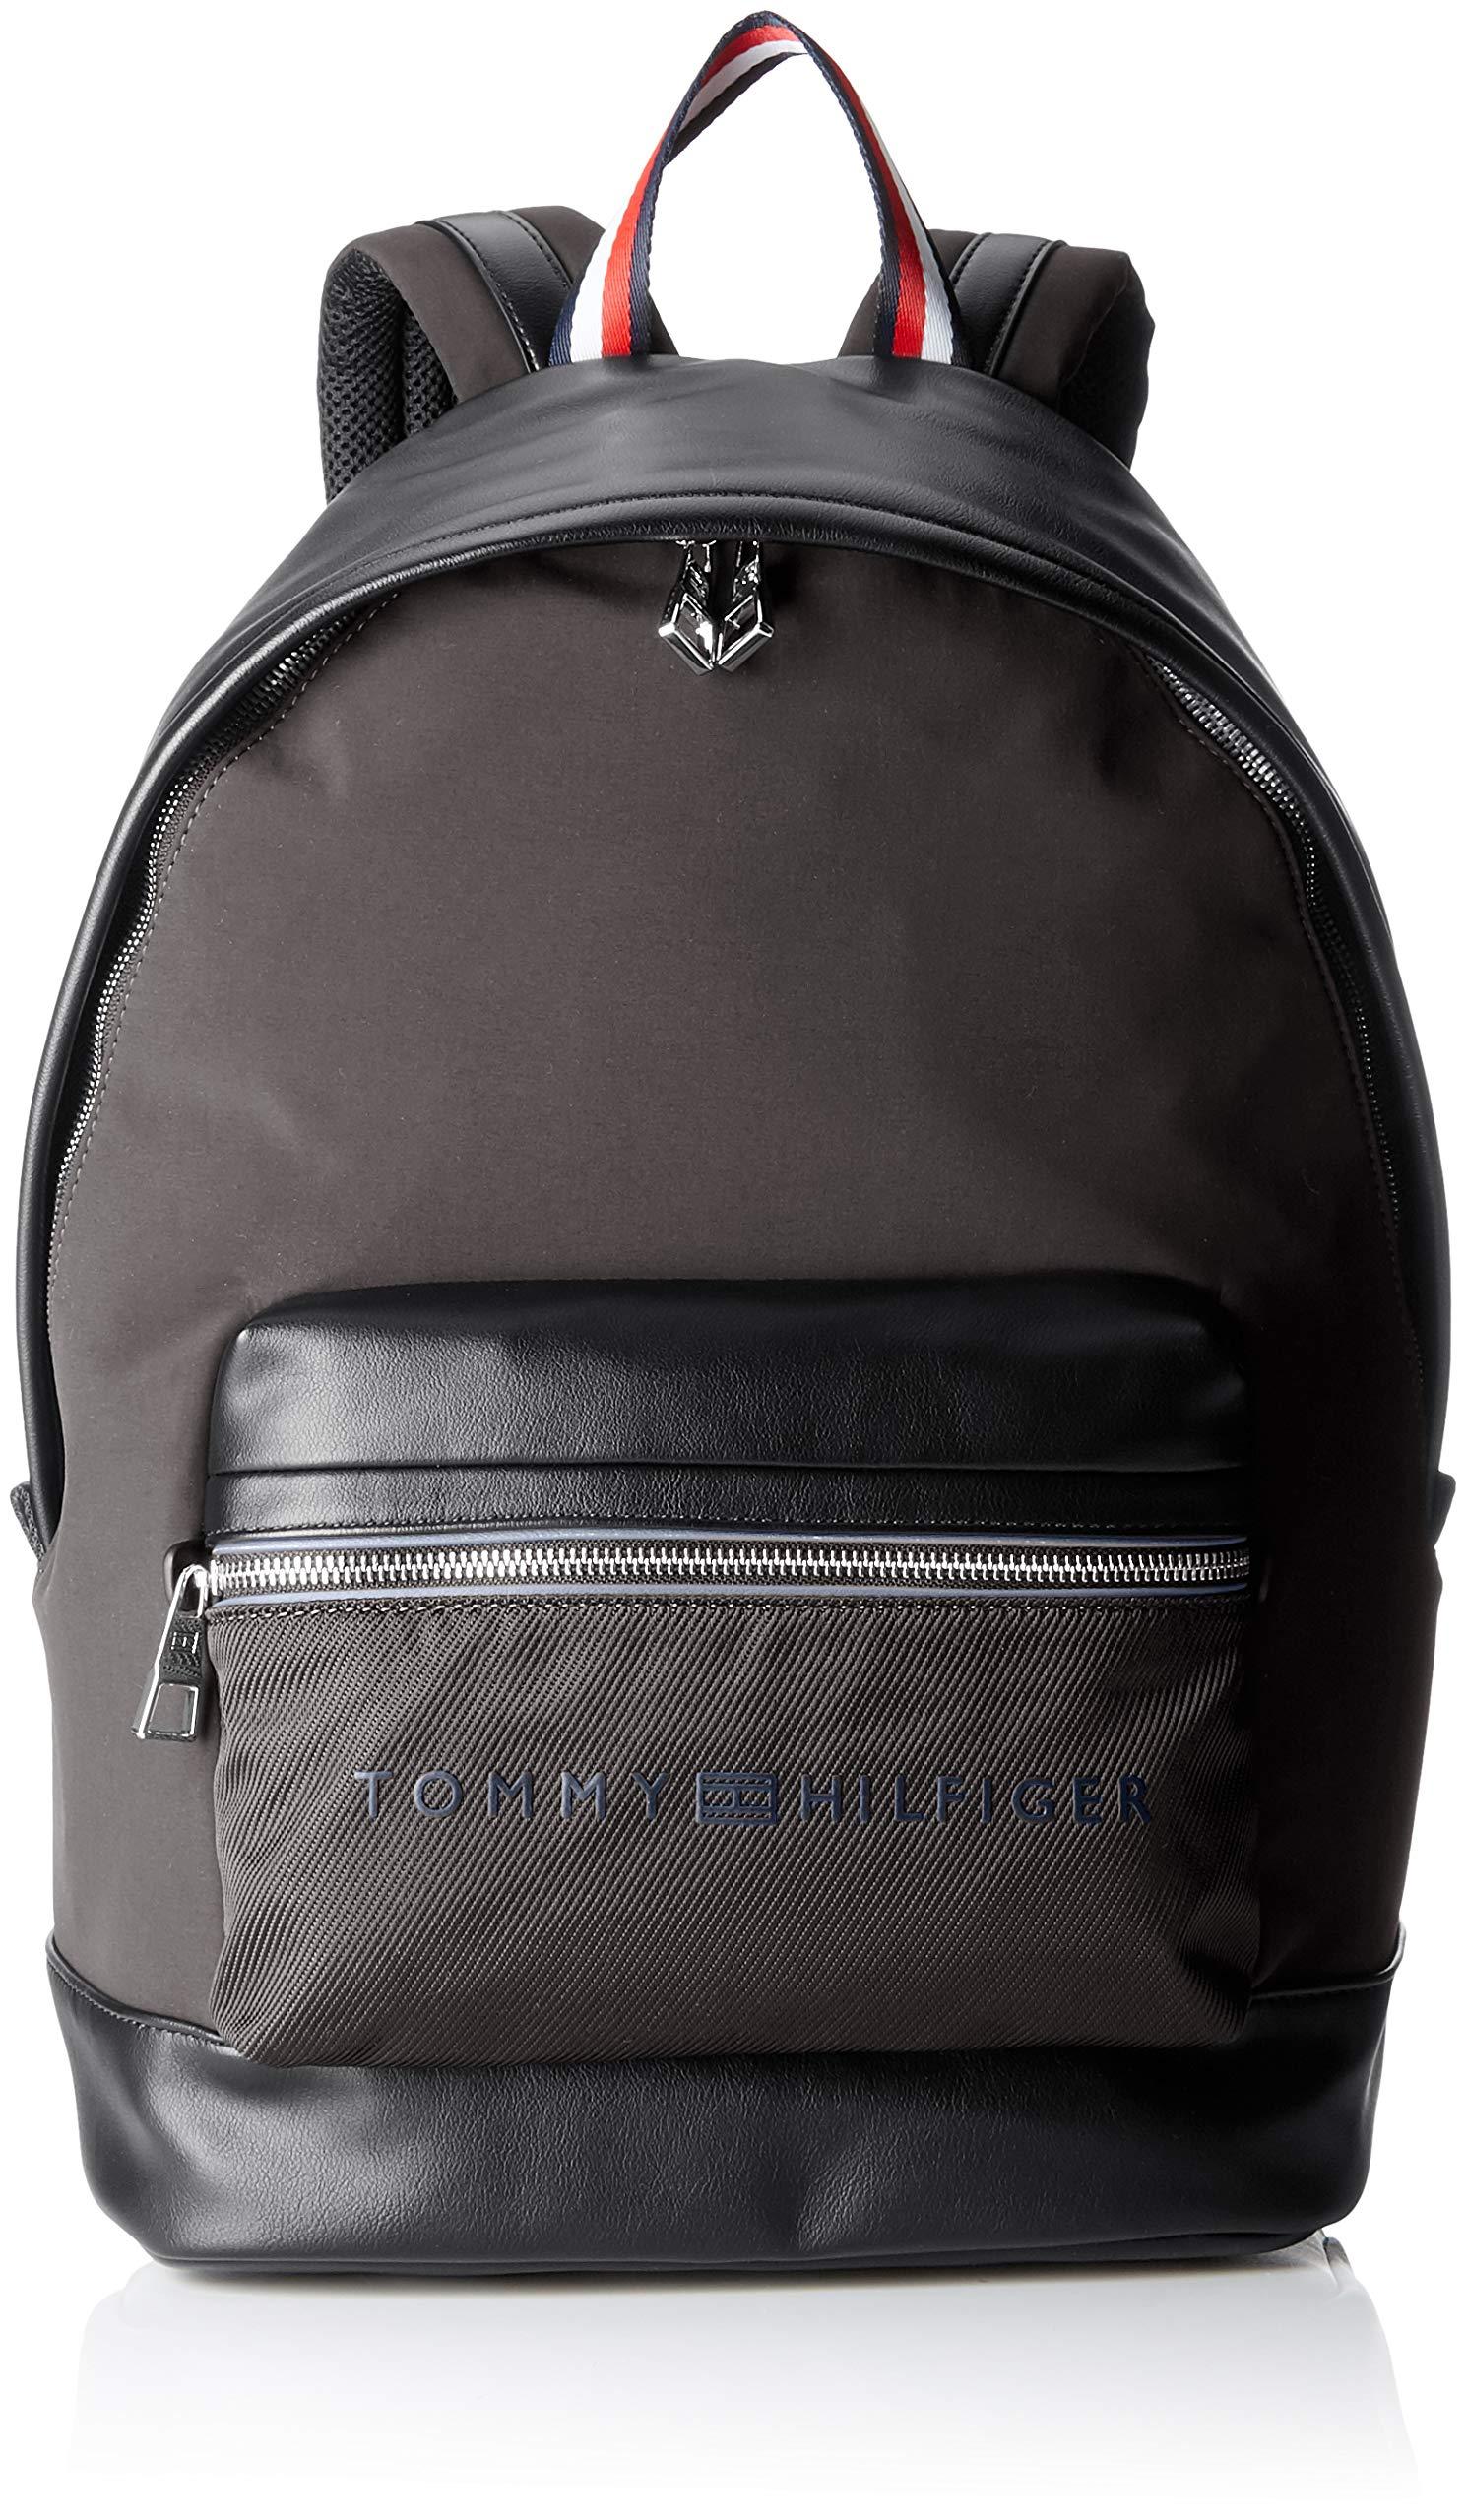 51baaac41610b Tommy Hilfiger Herren Urban Novelty Backpack Rucksack